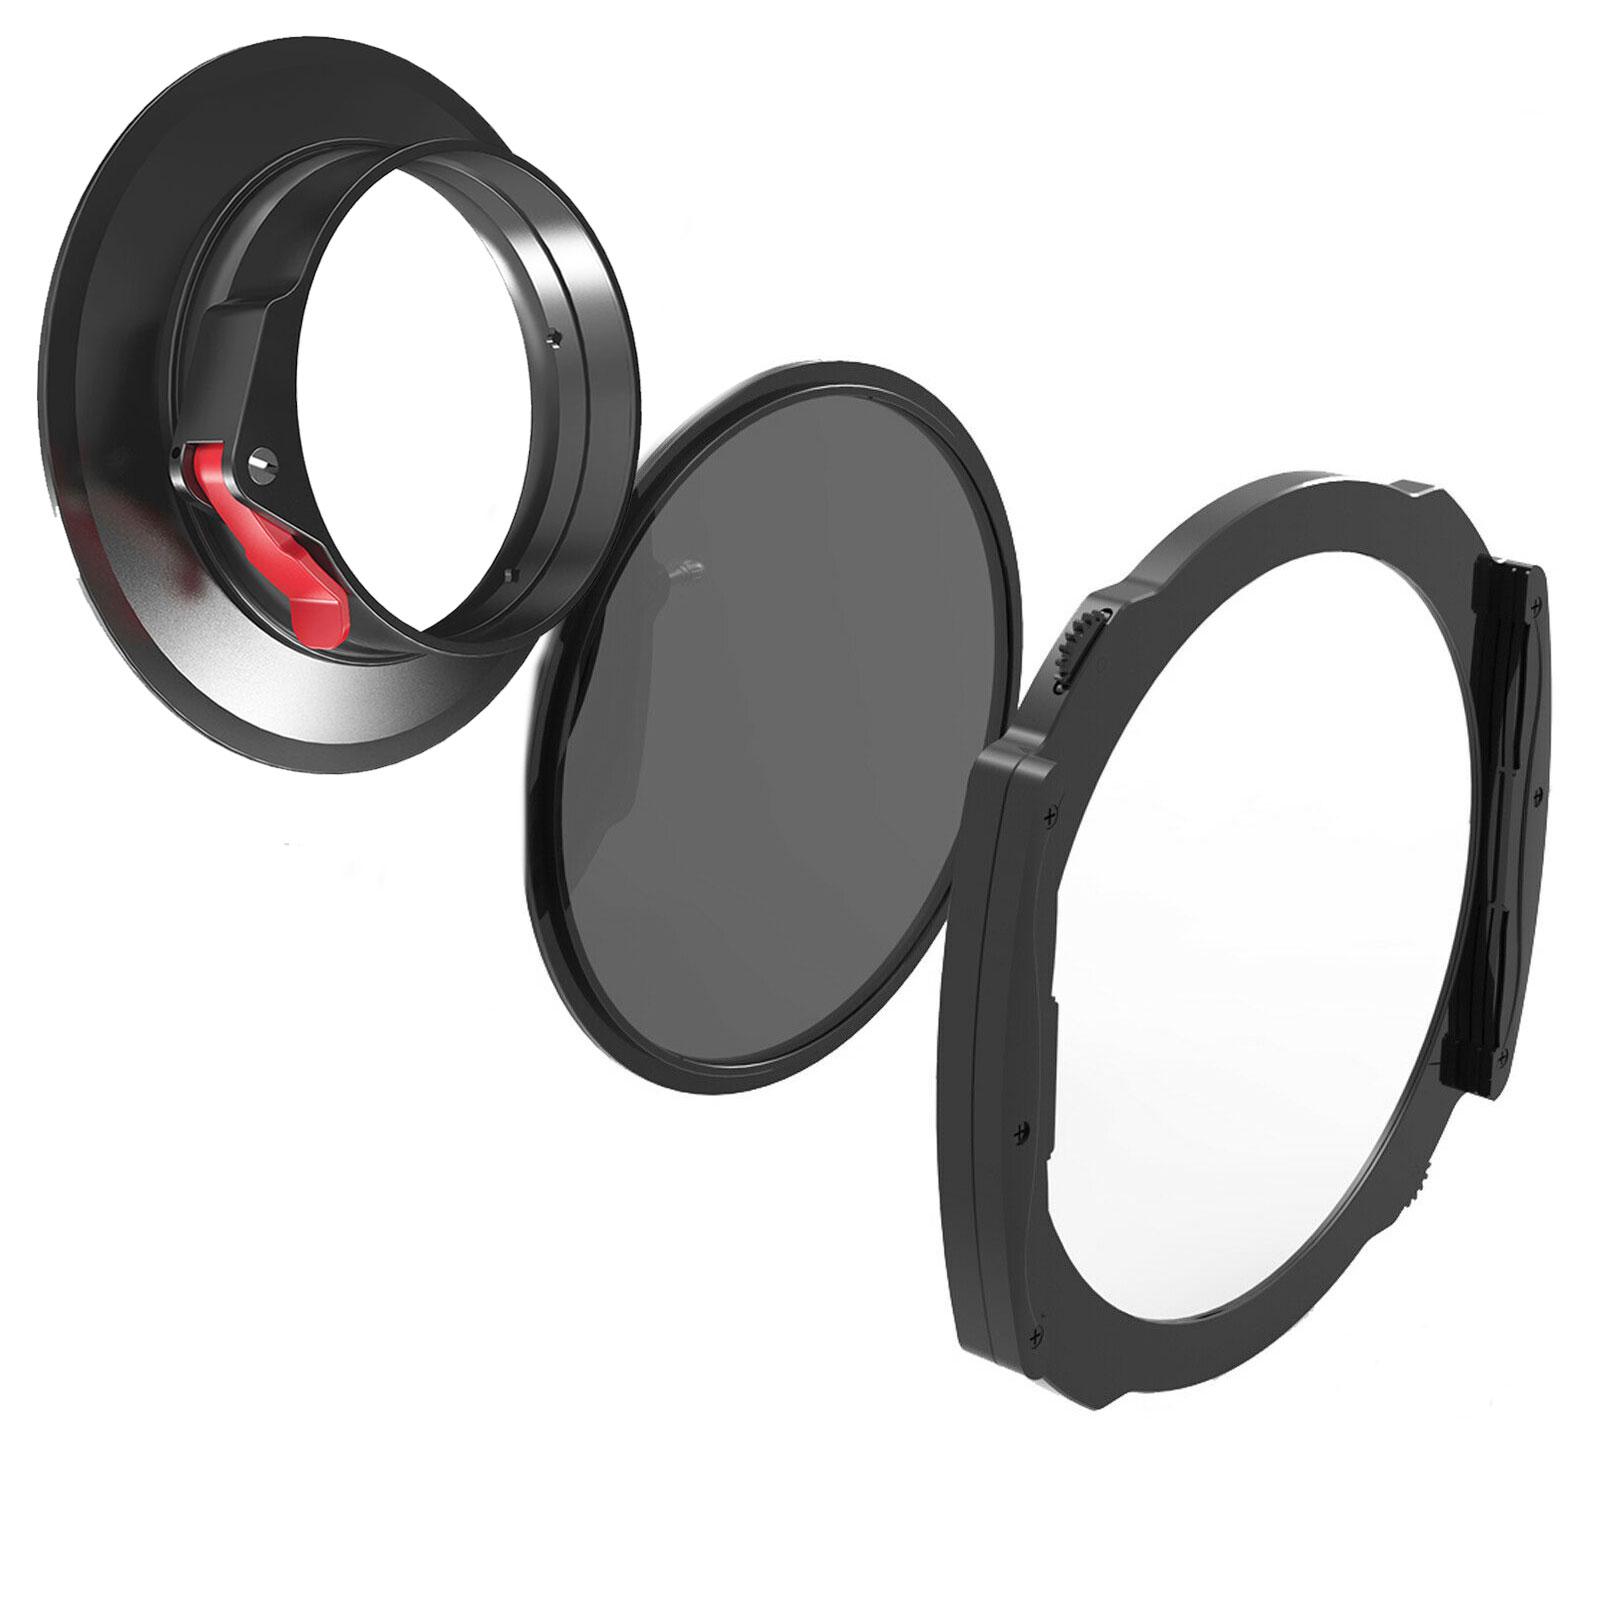 M15-Filter-Holder-Kit-CPL-Red-Ring